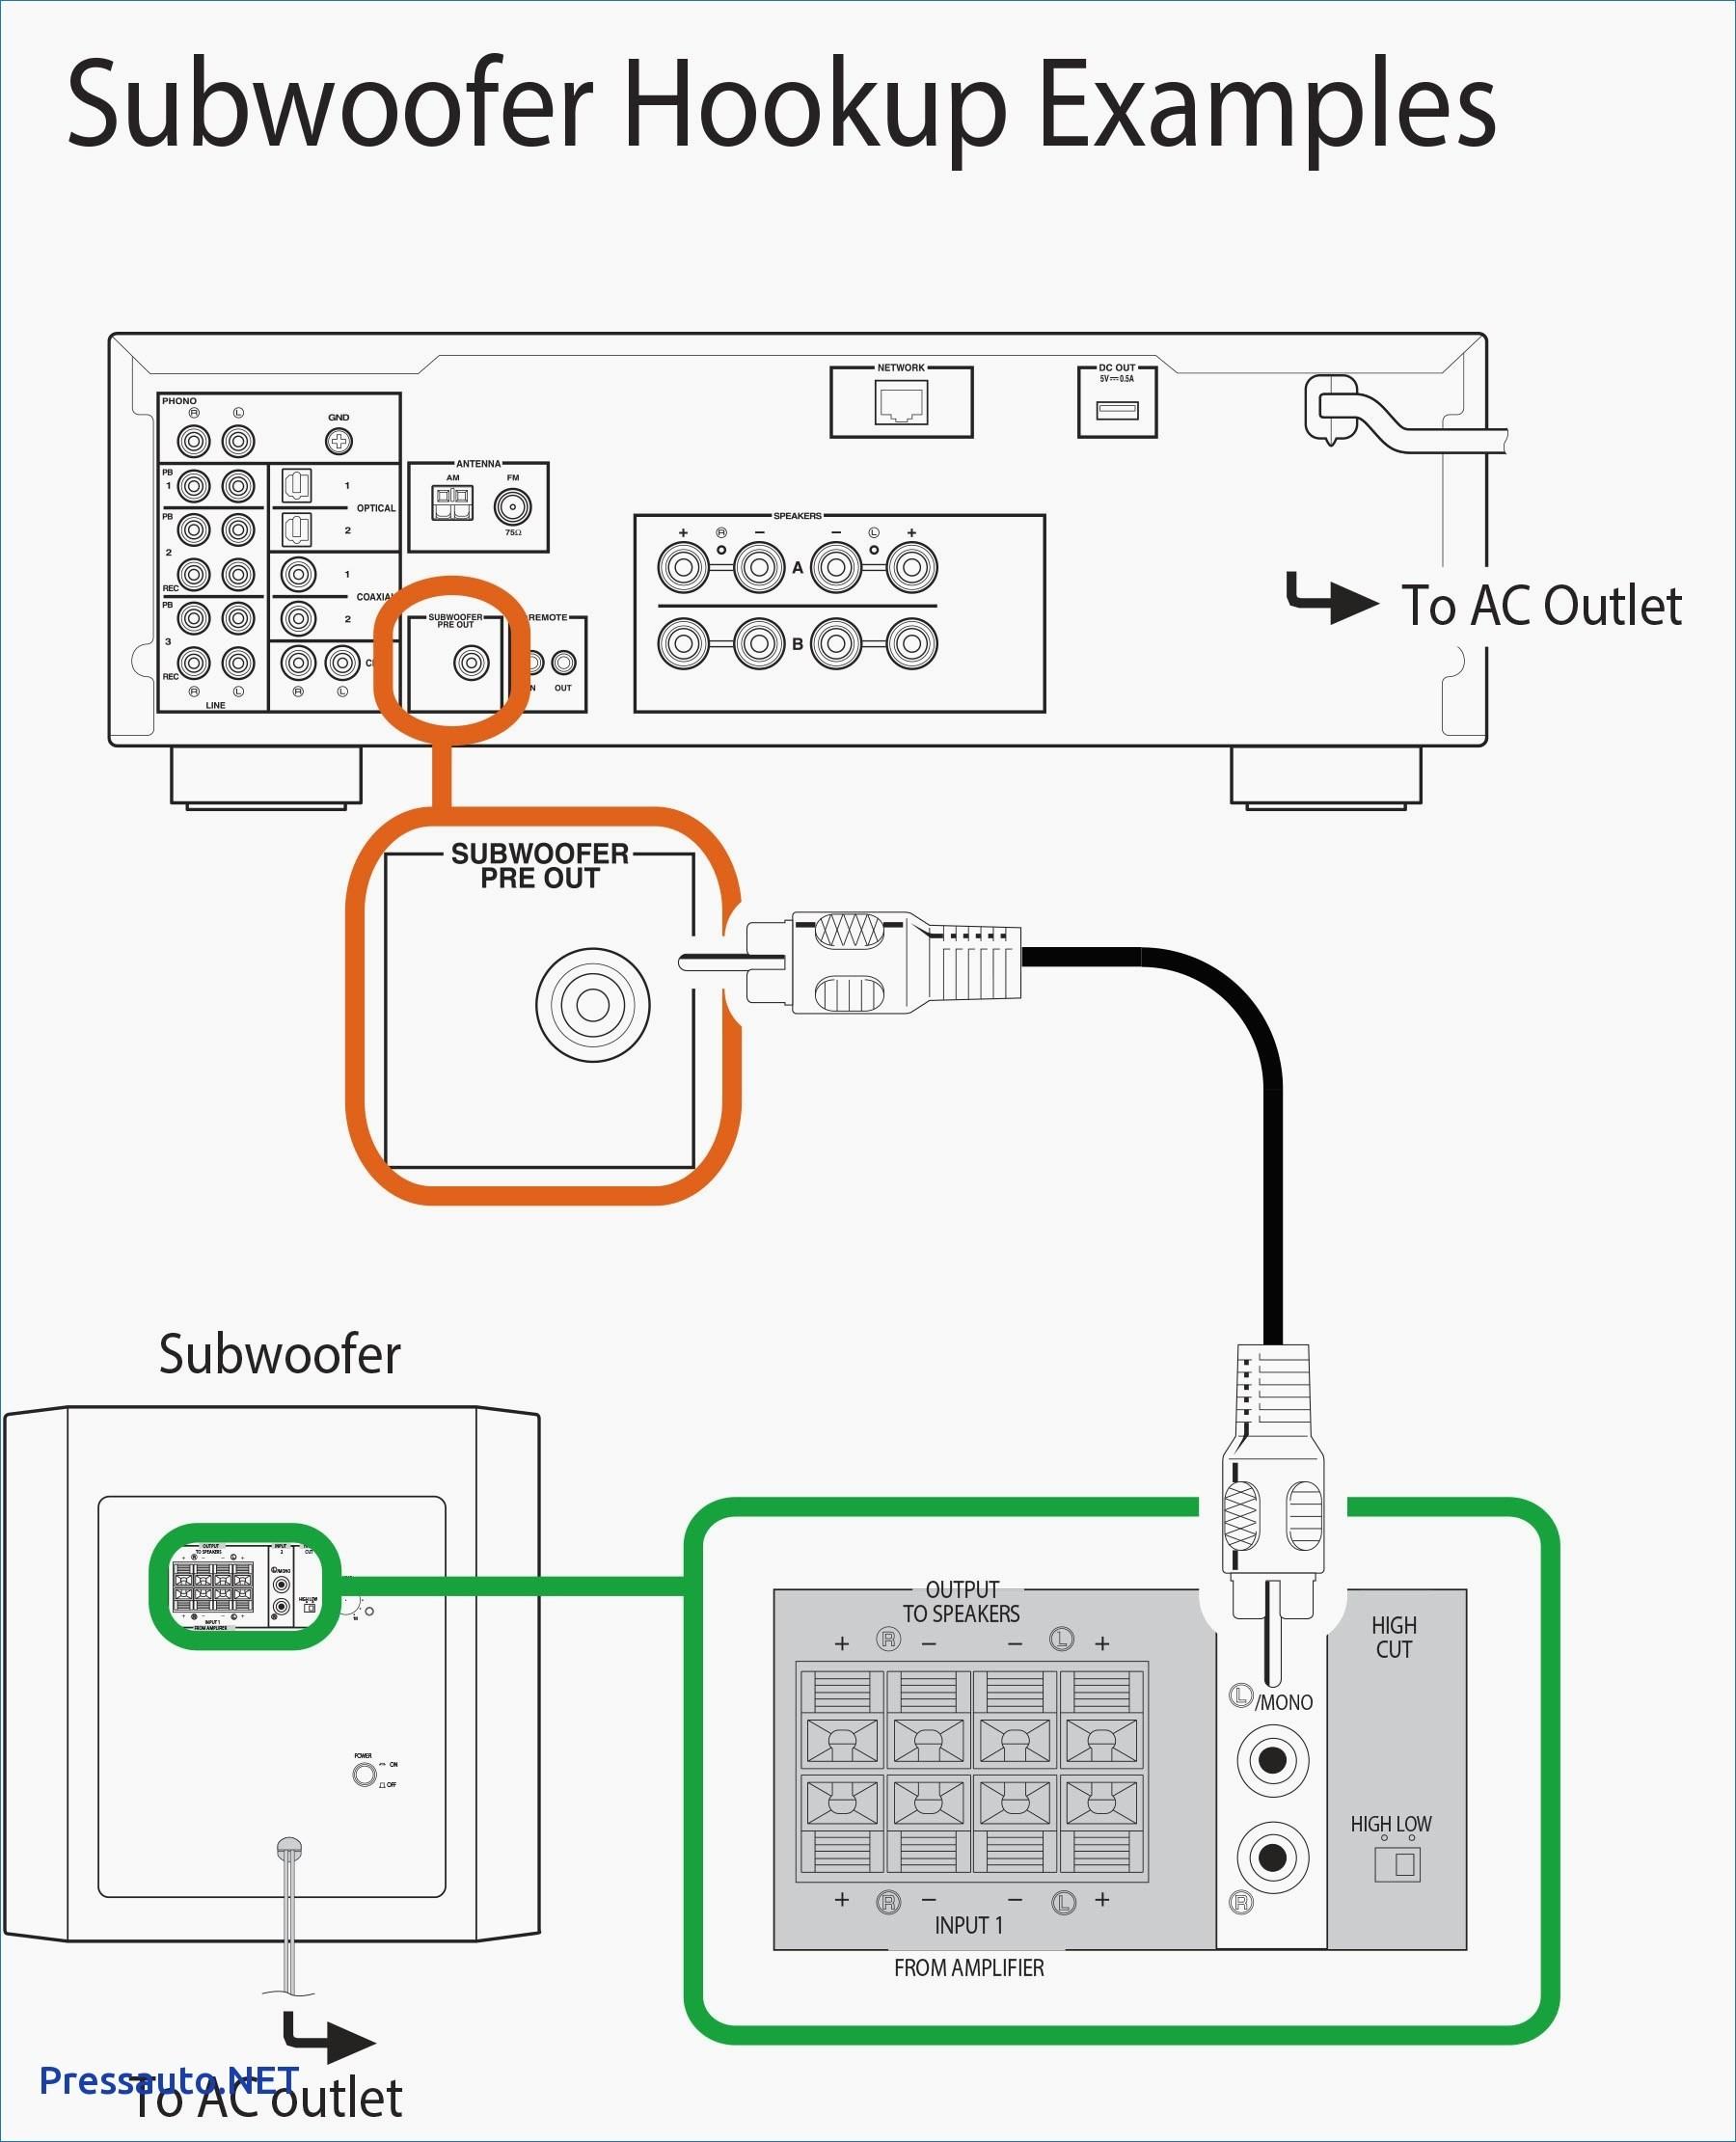 Powered Subwoofer Wiring Diagram Fresh Fios Wiring Diagram & Diagrams Cable Tv Wiring Diagrams for